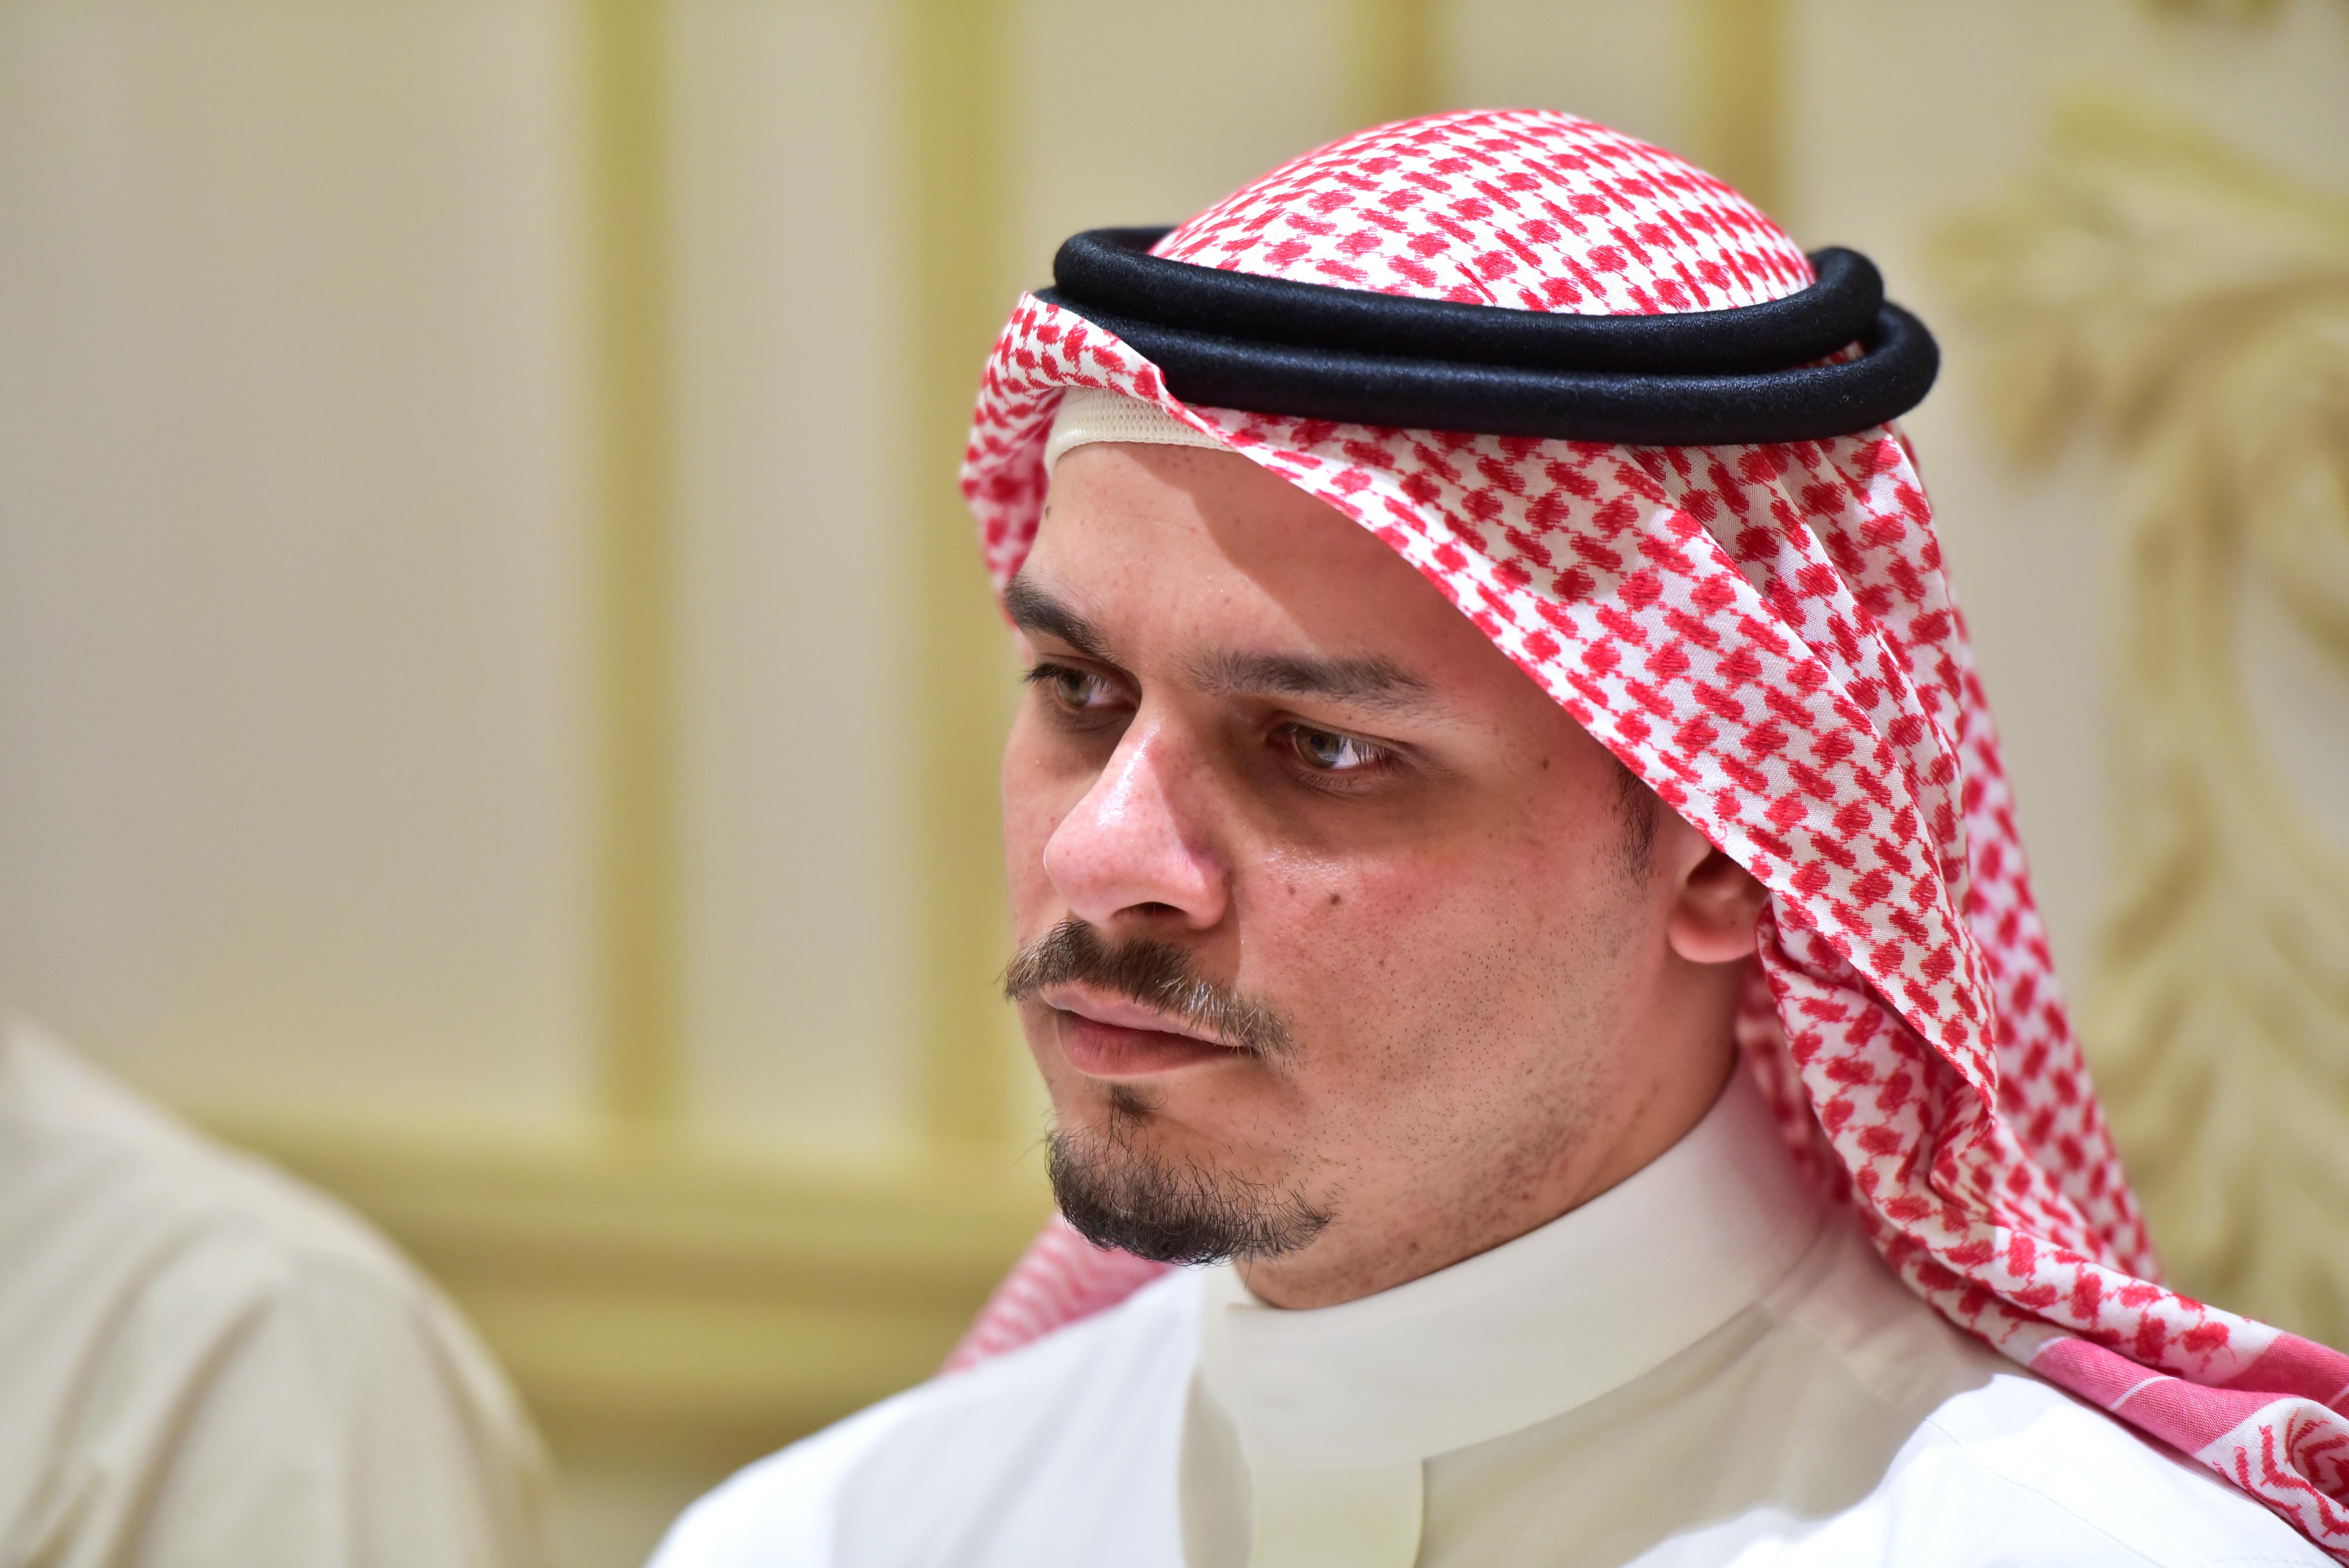 Salah Khashoggi, son of Saudi journalist Jamal Khashoggi, looks on as mourners offer condolences in Jeddah, Saudi Arabia November 16, 2018. REUTERS/Waleed Ali.